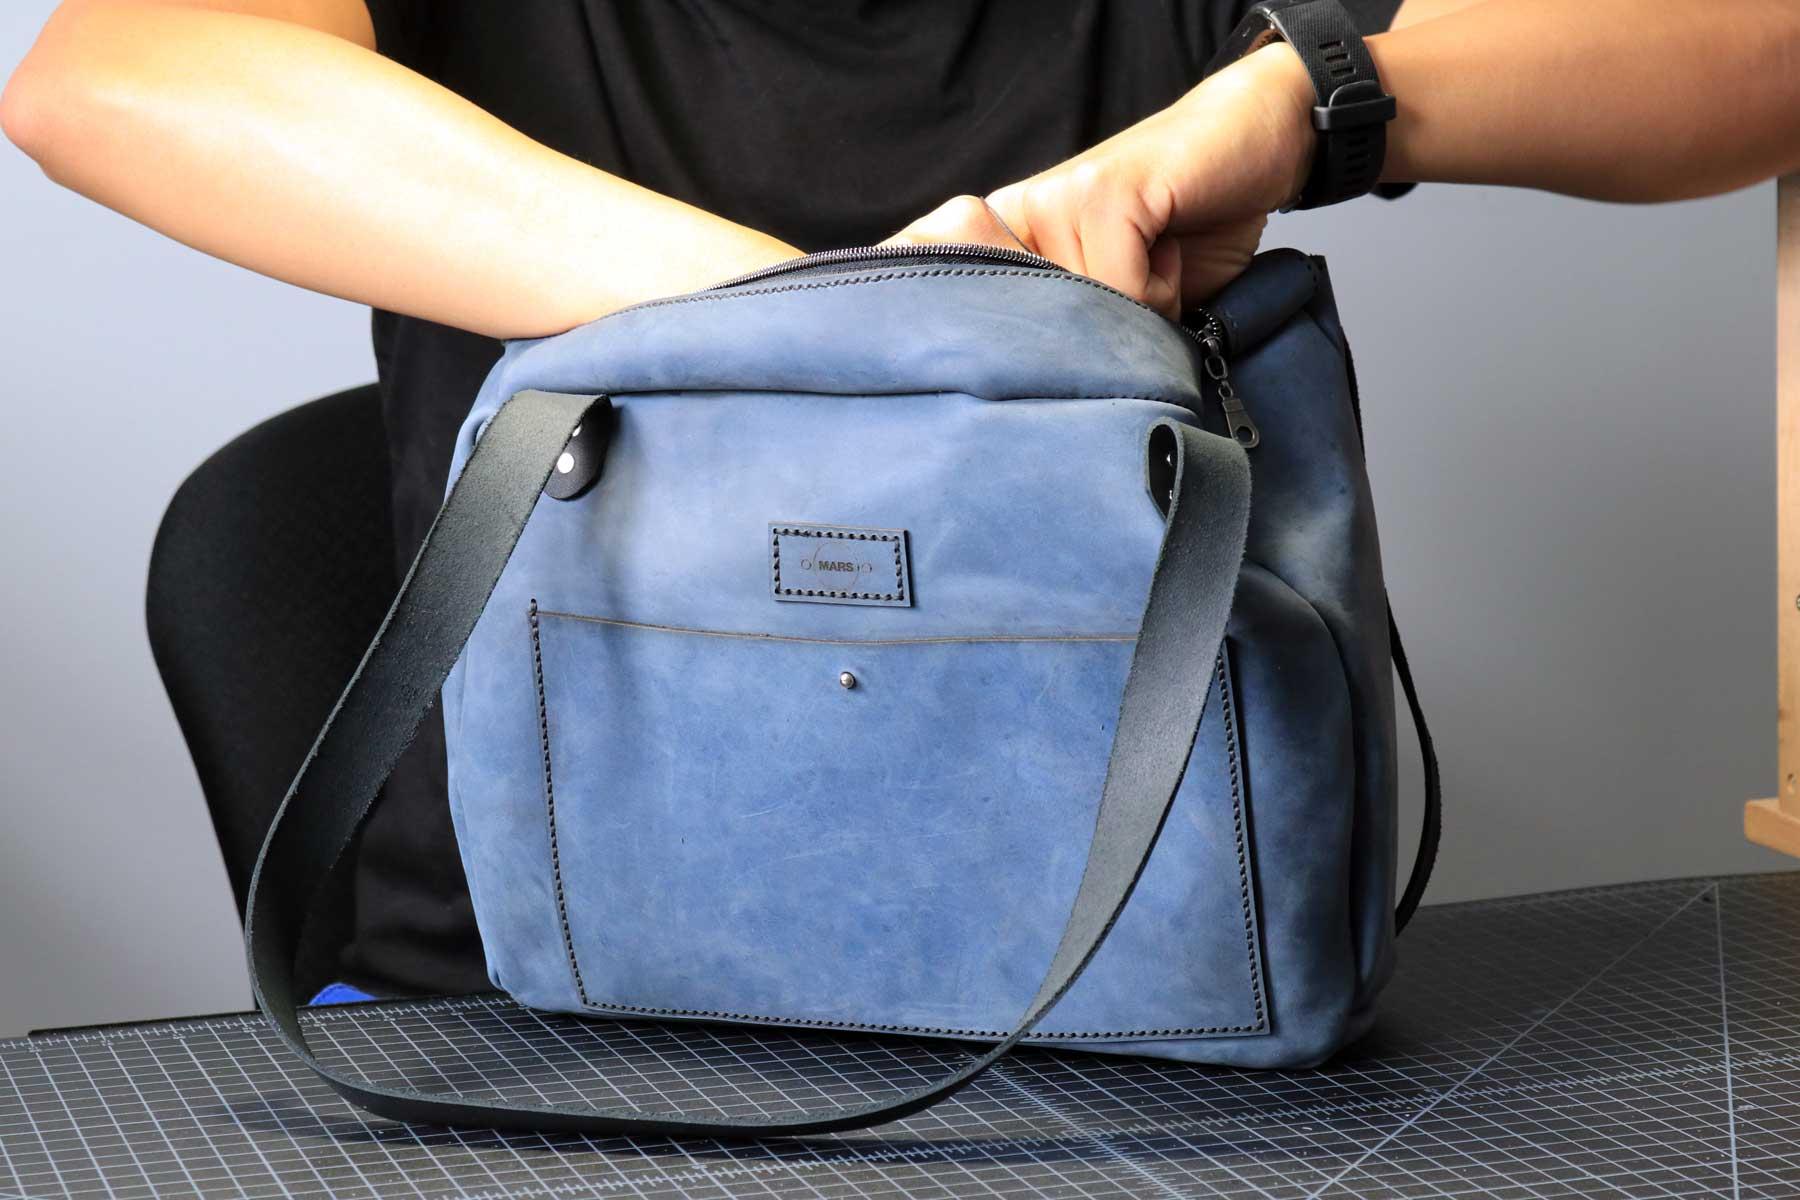 10_Mars-Everyday-Bag-With-Zipper-01.jpg